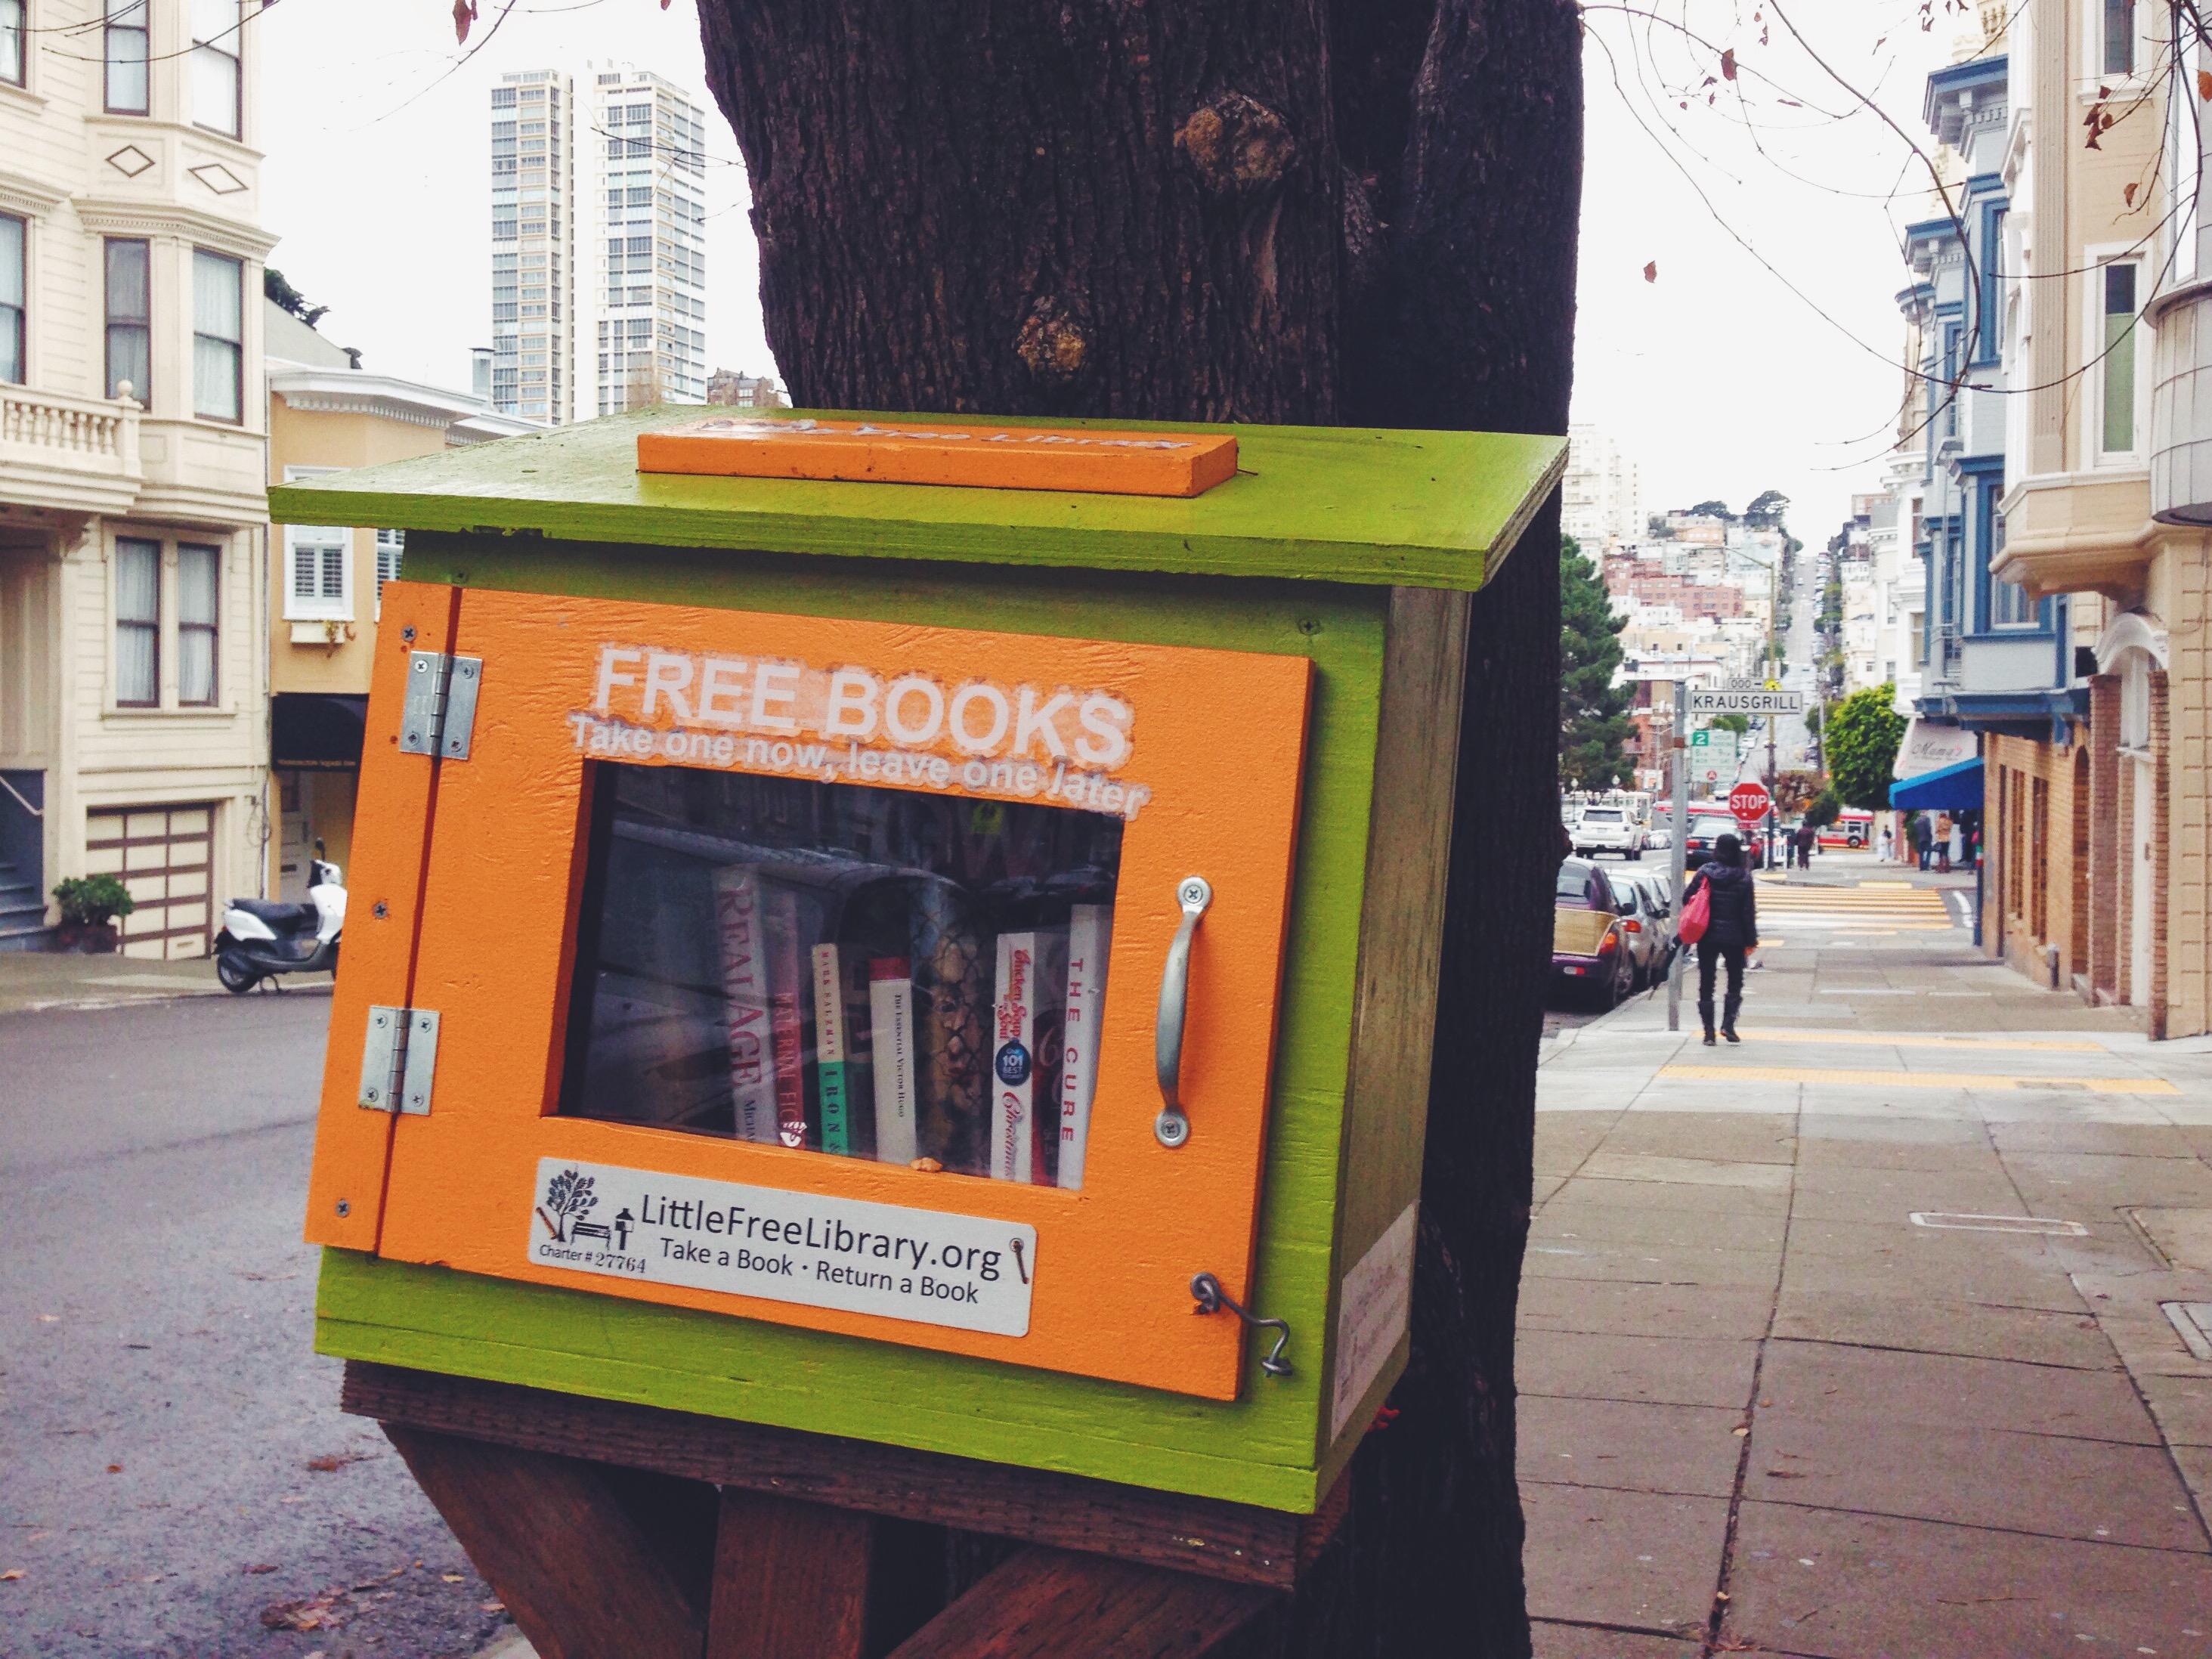 Libreria gratuita - Free Books